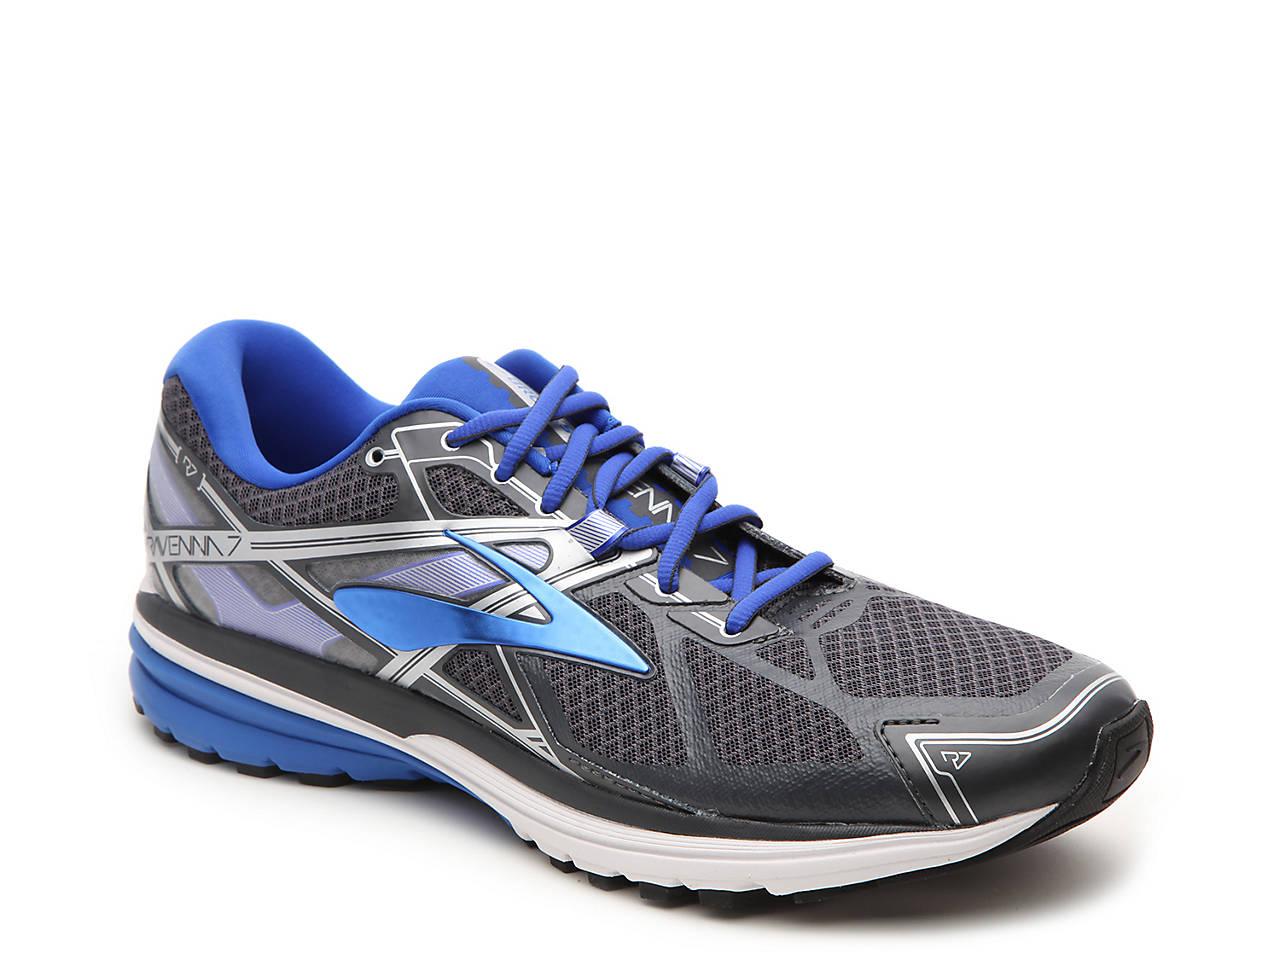 9b980c25aa723 Brooks Ravenna 7 Performance Running Shoe - Men s Men s Shoes